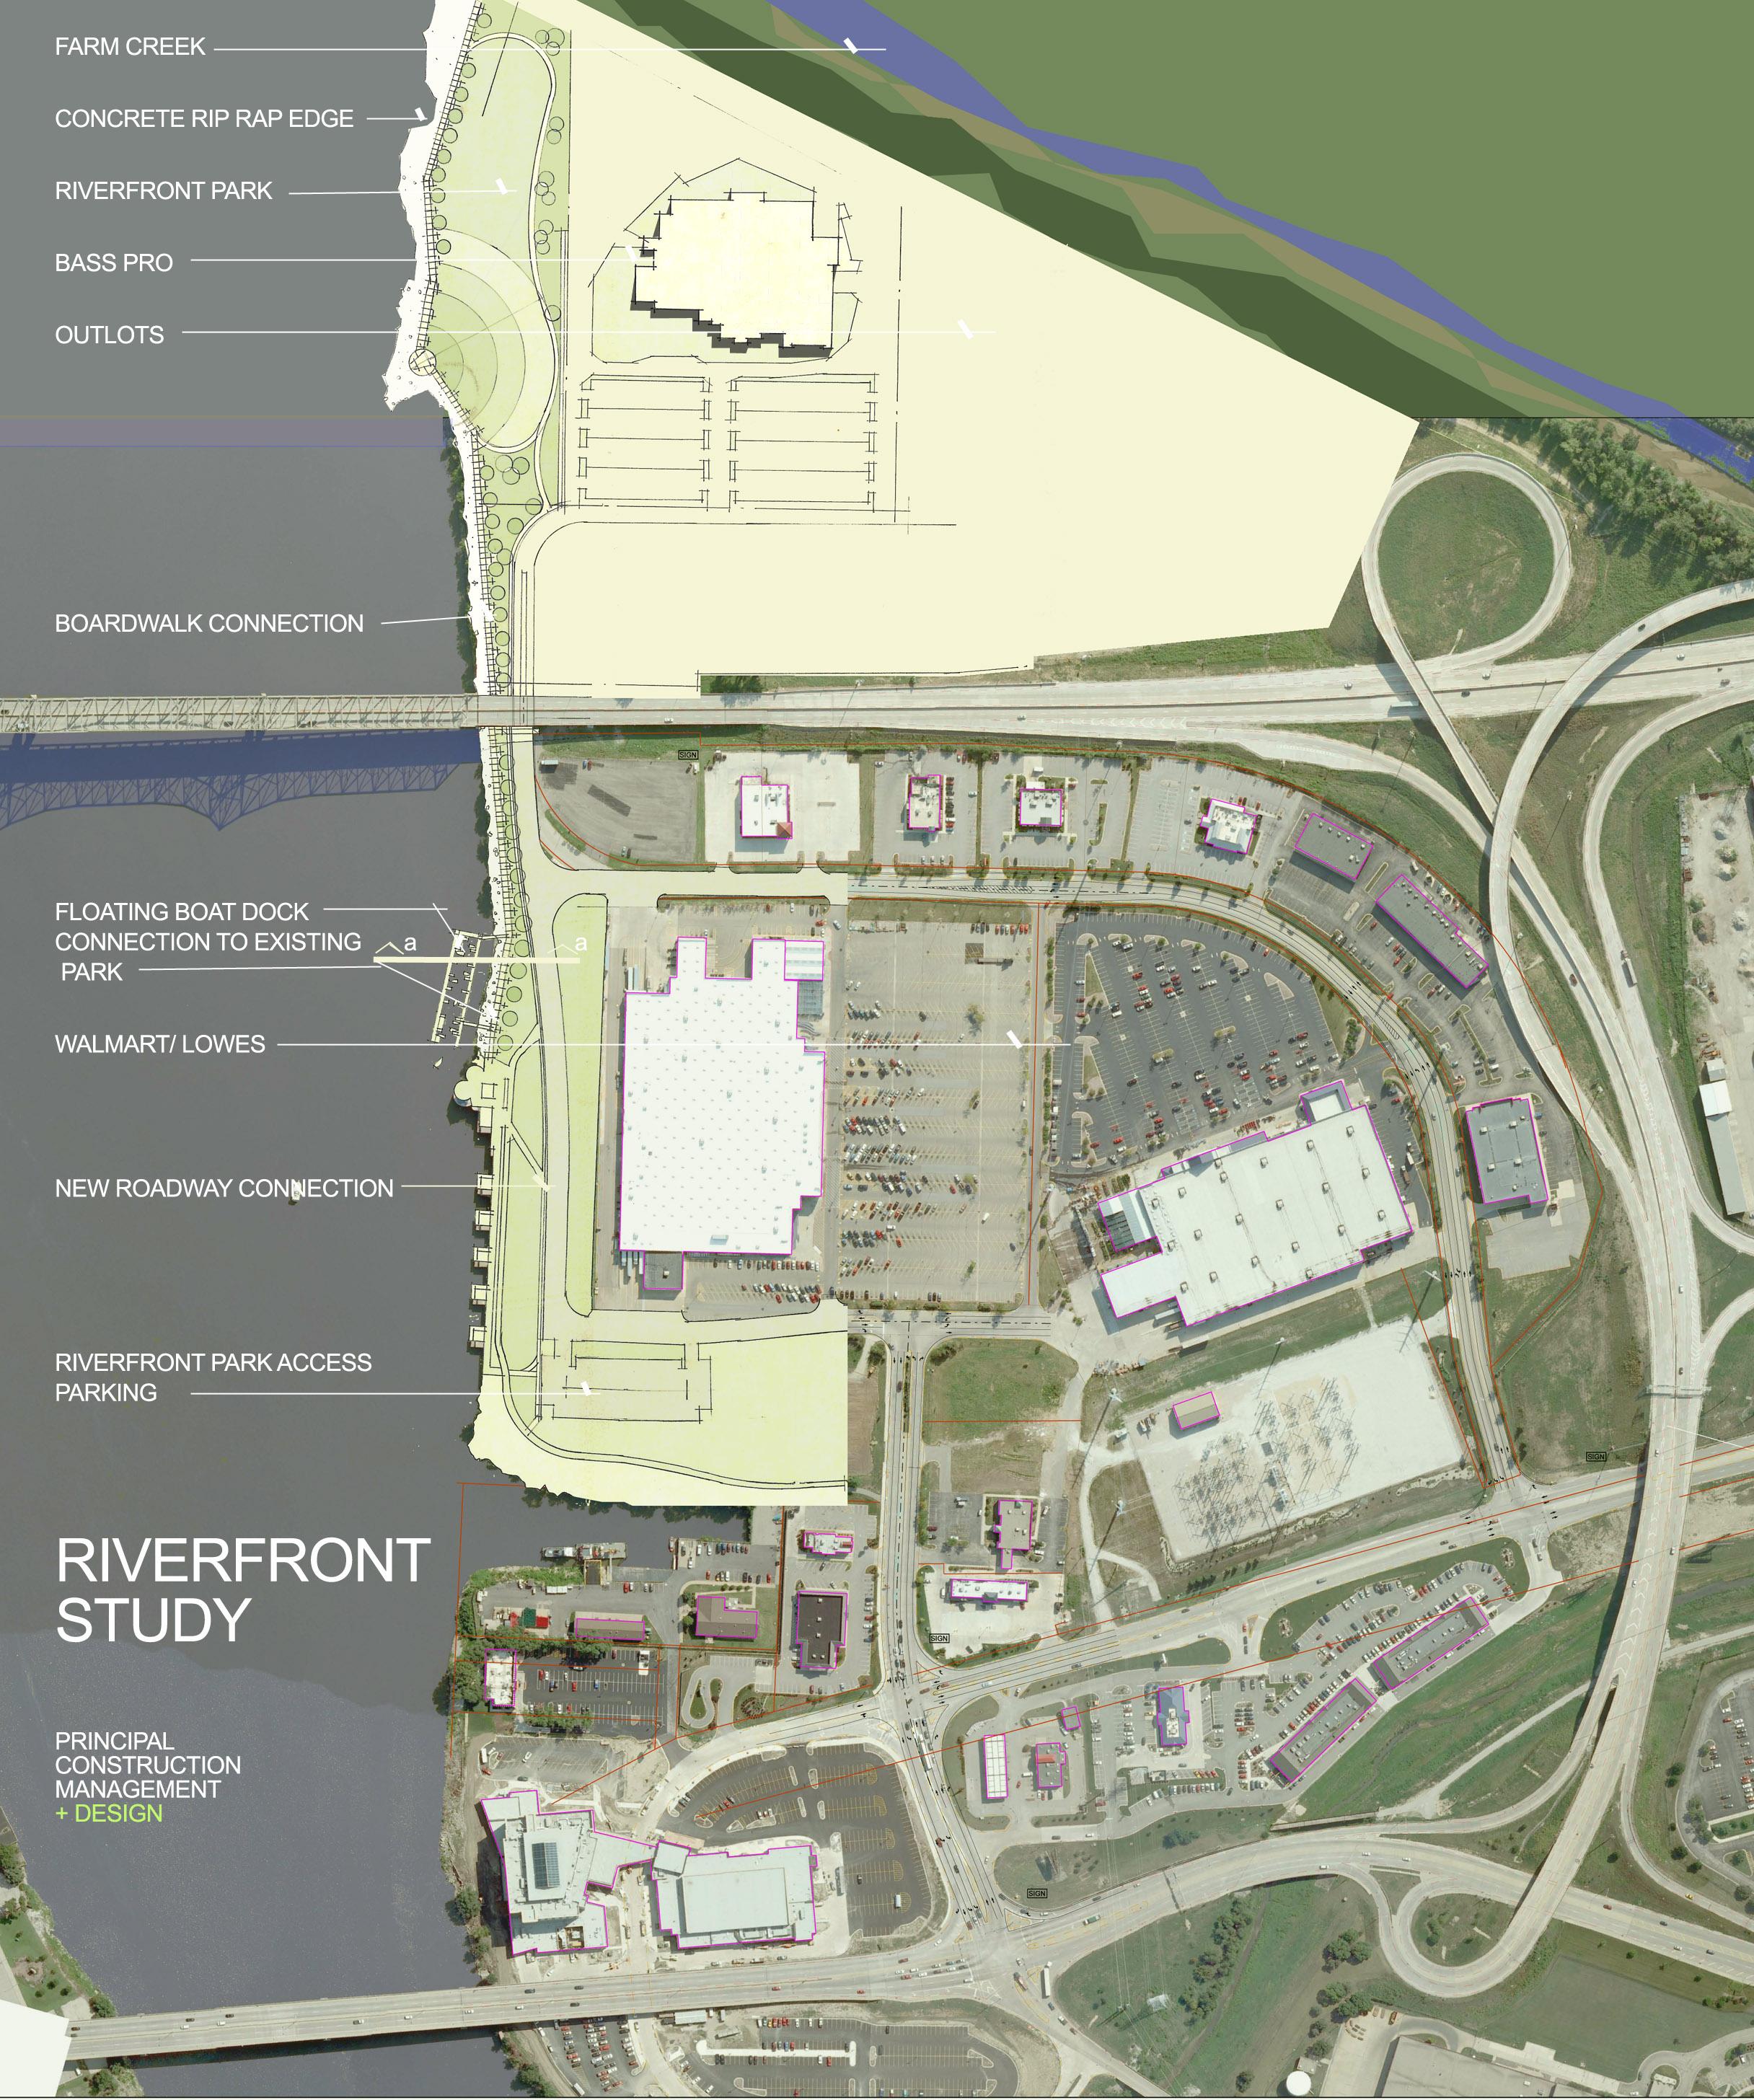 riverfront boardwalk study 1 copy.jpg